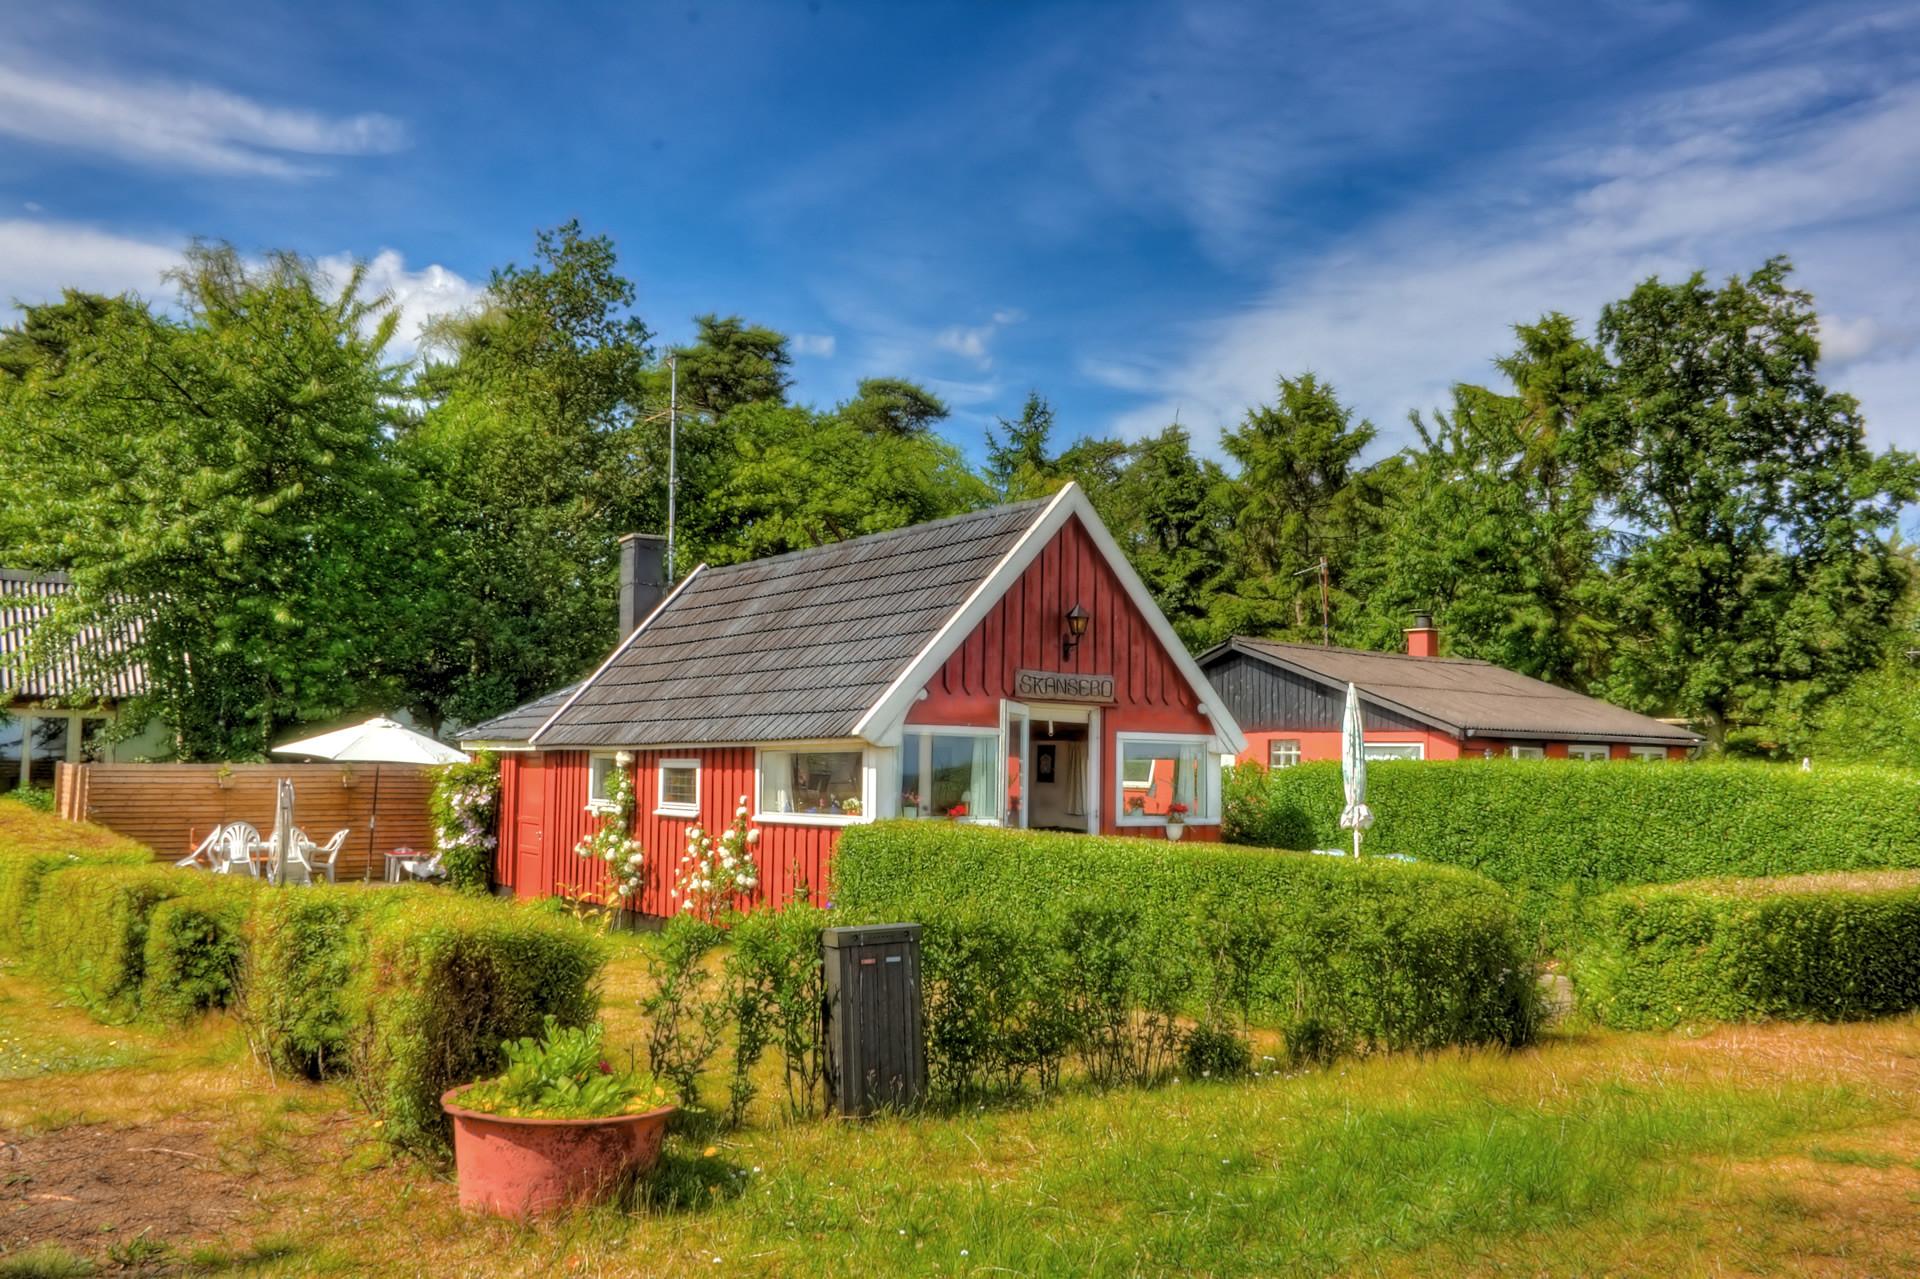 Farmhouse Backgrounds Free Download | PixelsTalk.Net